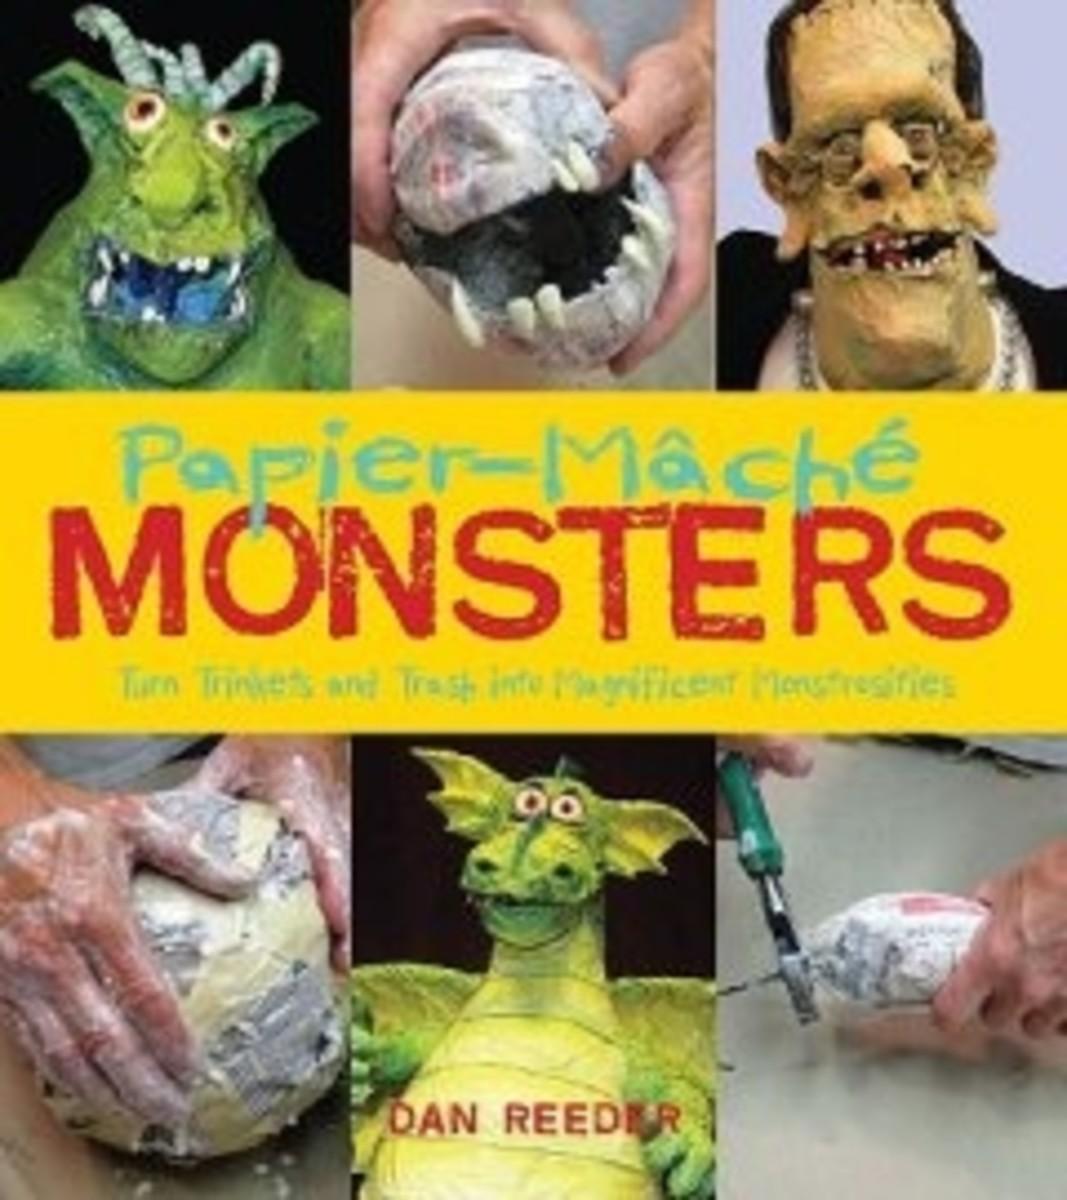 Papier-Mache Monsters: Turn Trinkets and Trash into Magnificent Monstrosities   ~ Dan Reeder